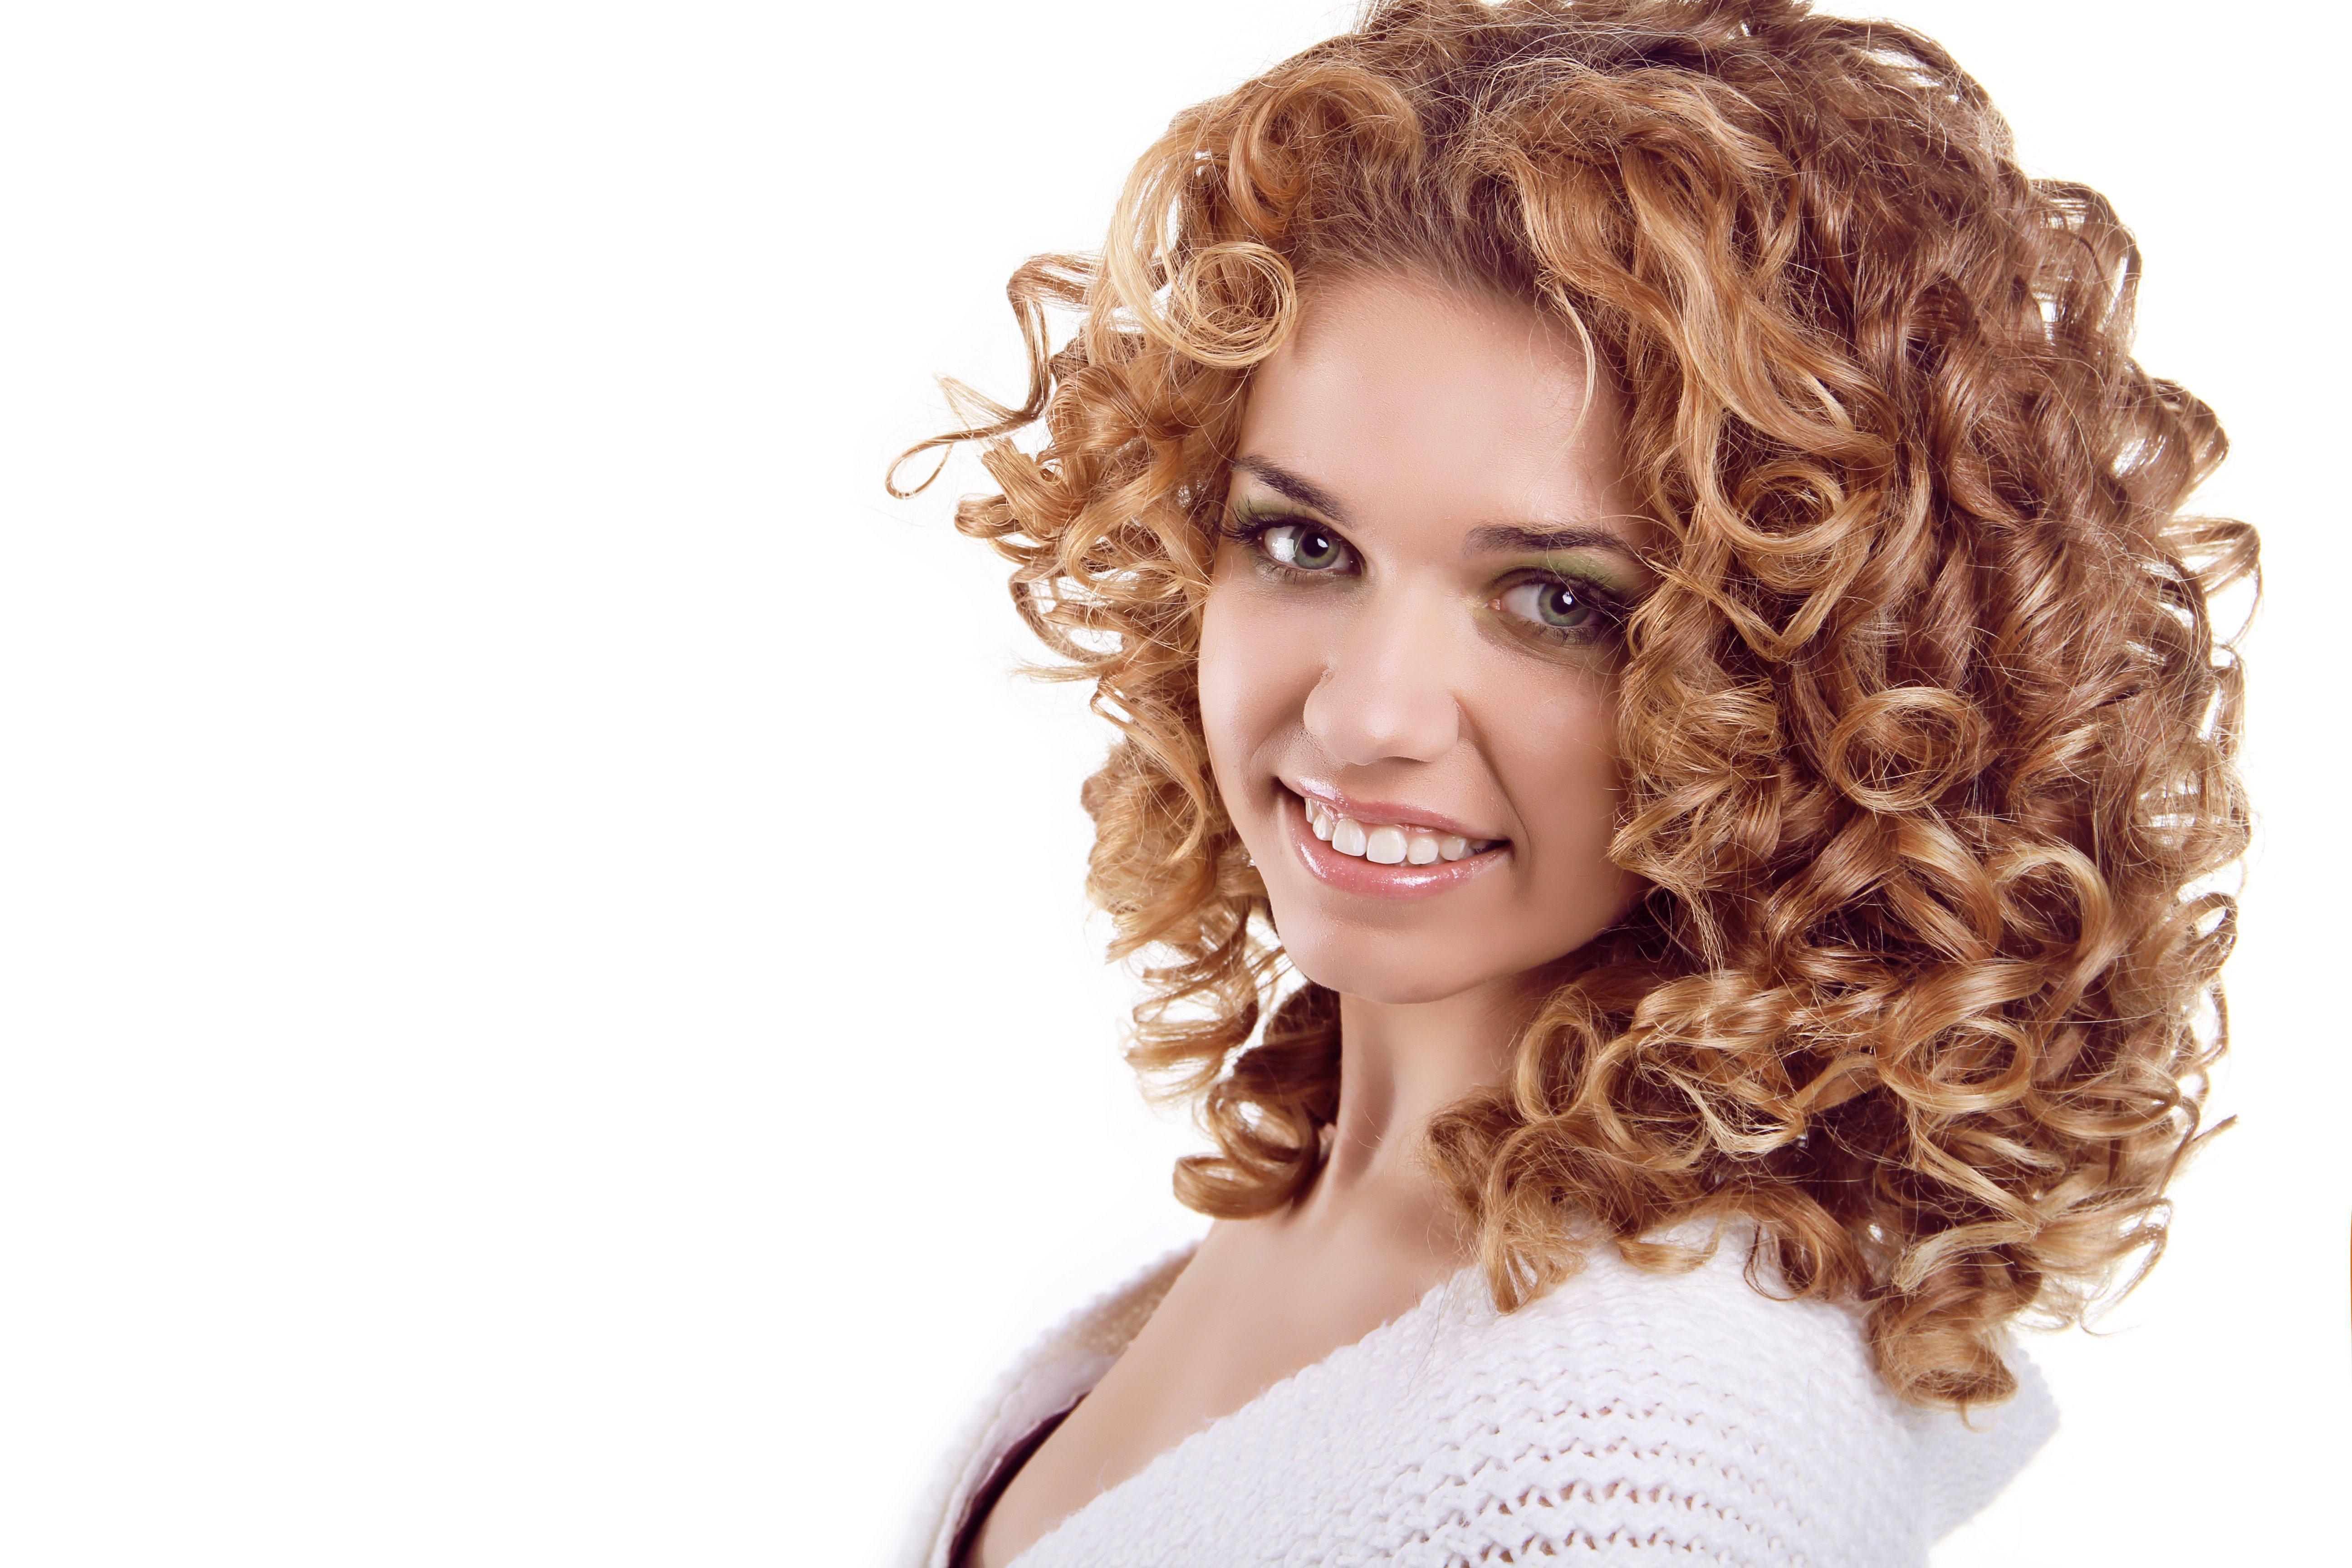 lovely fotos de cabelos imagem-Top Fotos De Cabelos Fotografia